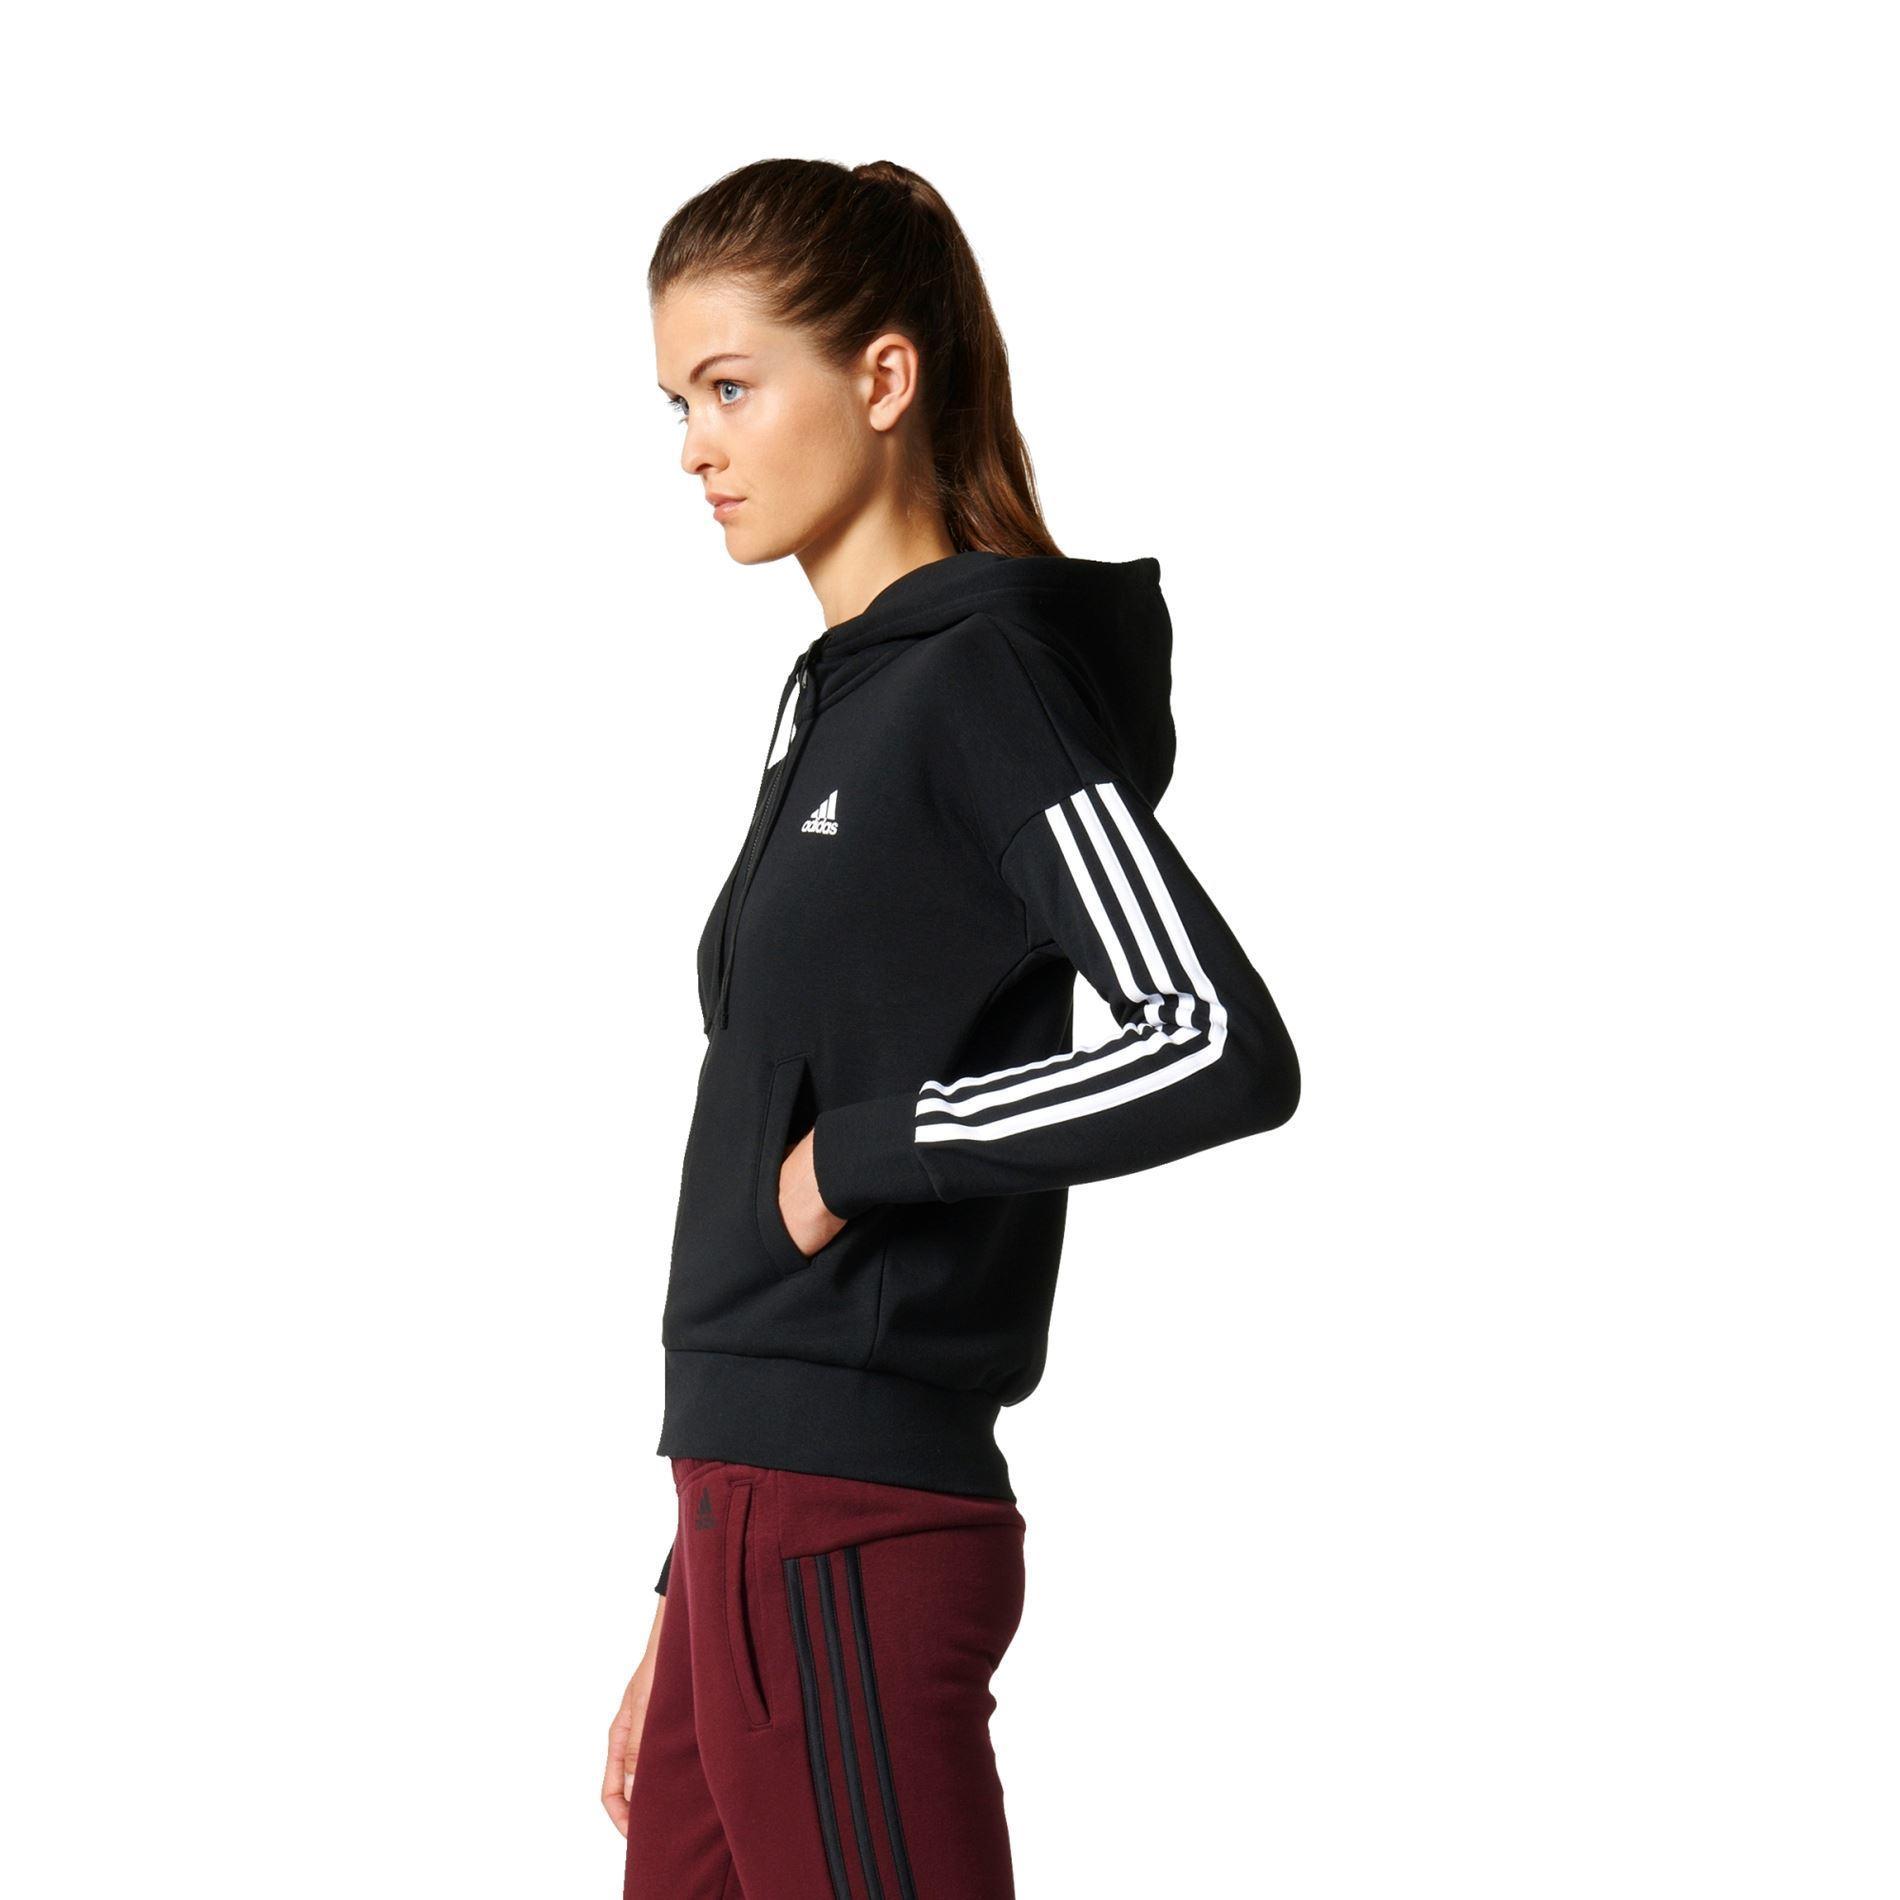 4c424d32 Adidas Essential 3S Hettejakke Dame Byåsen Håndball- Fotballsko.no ...